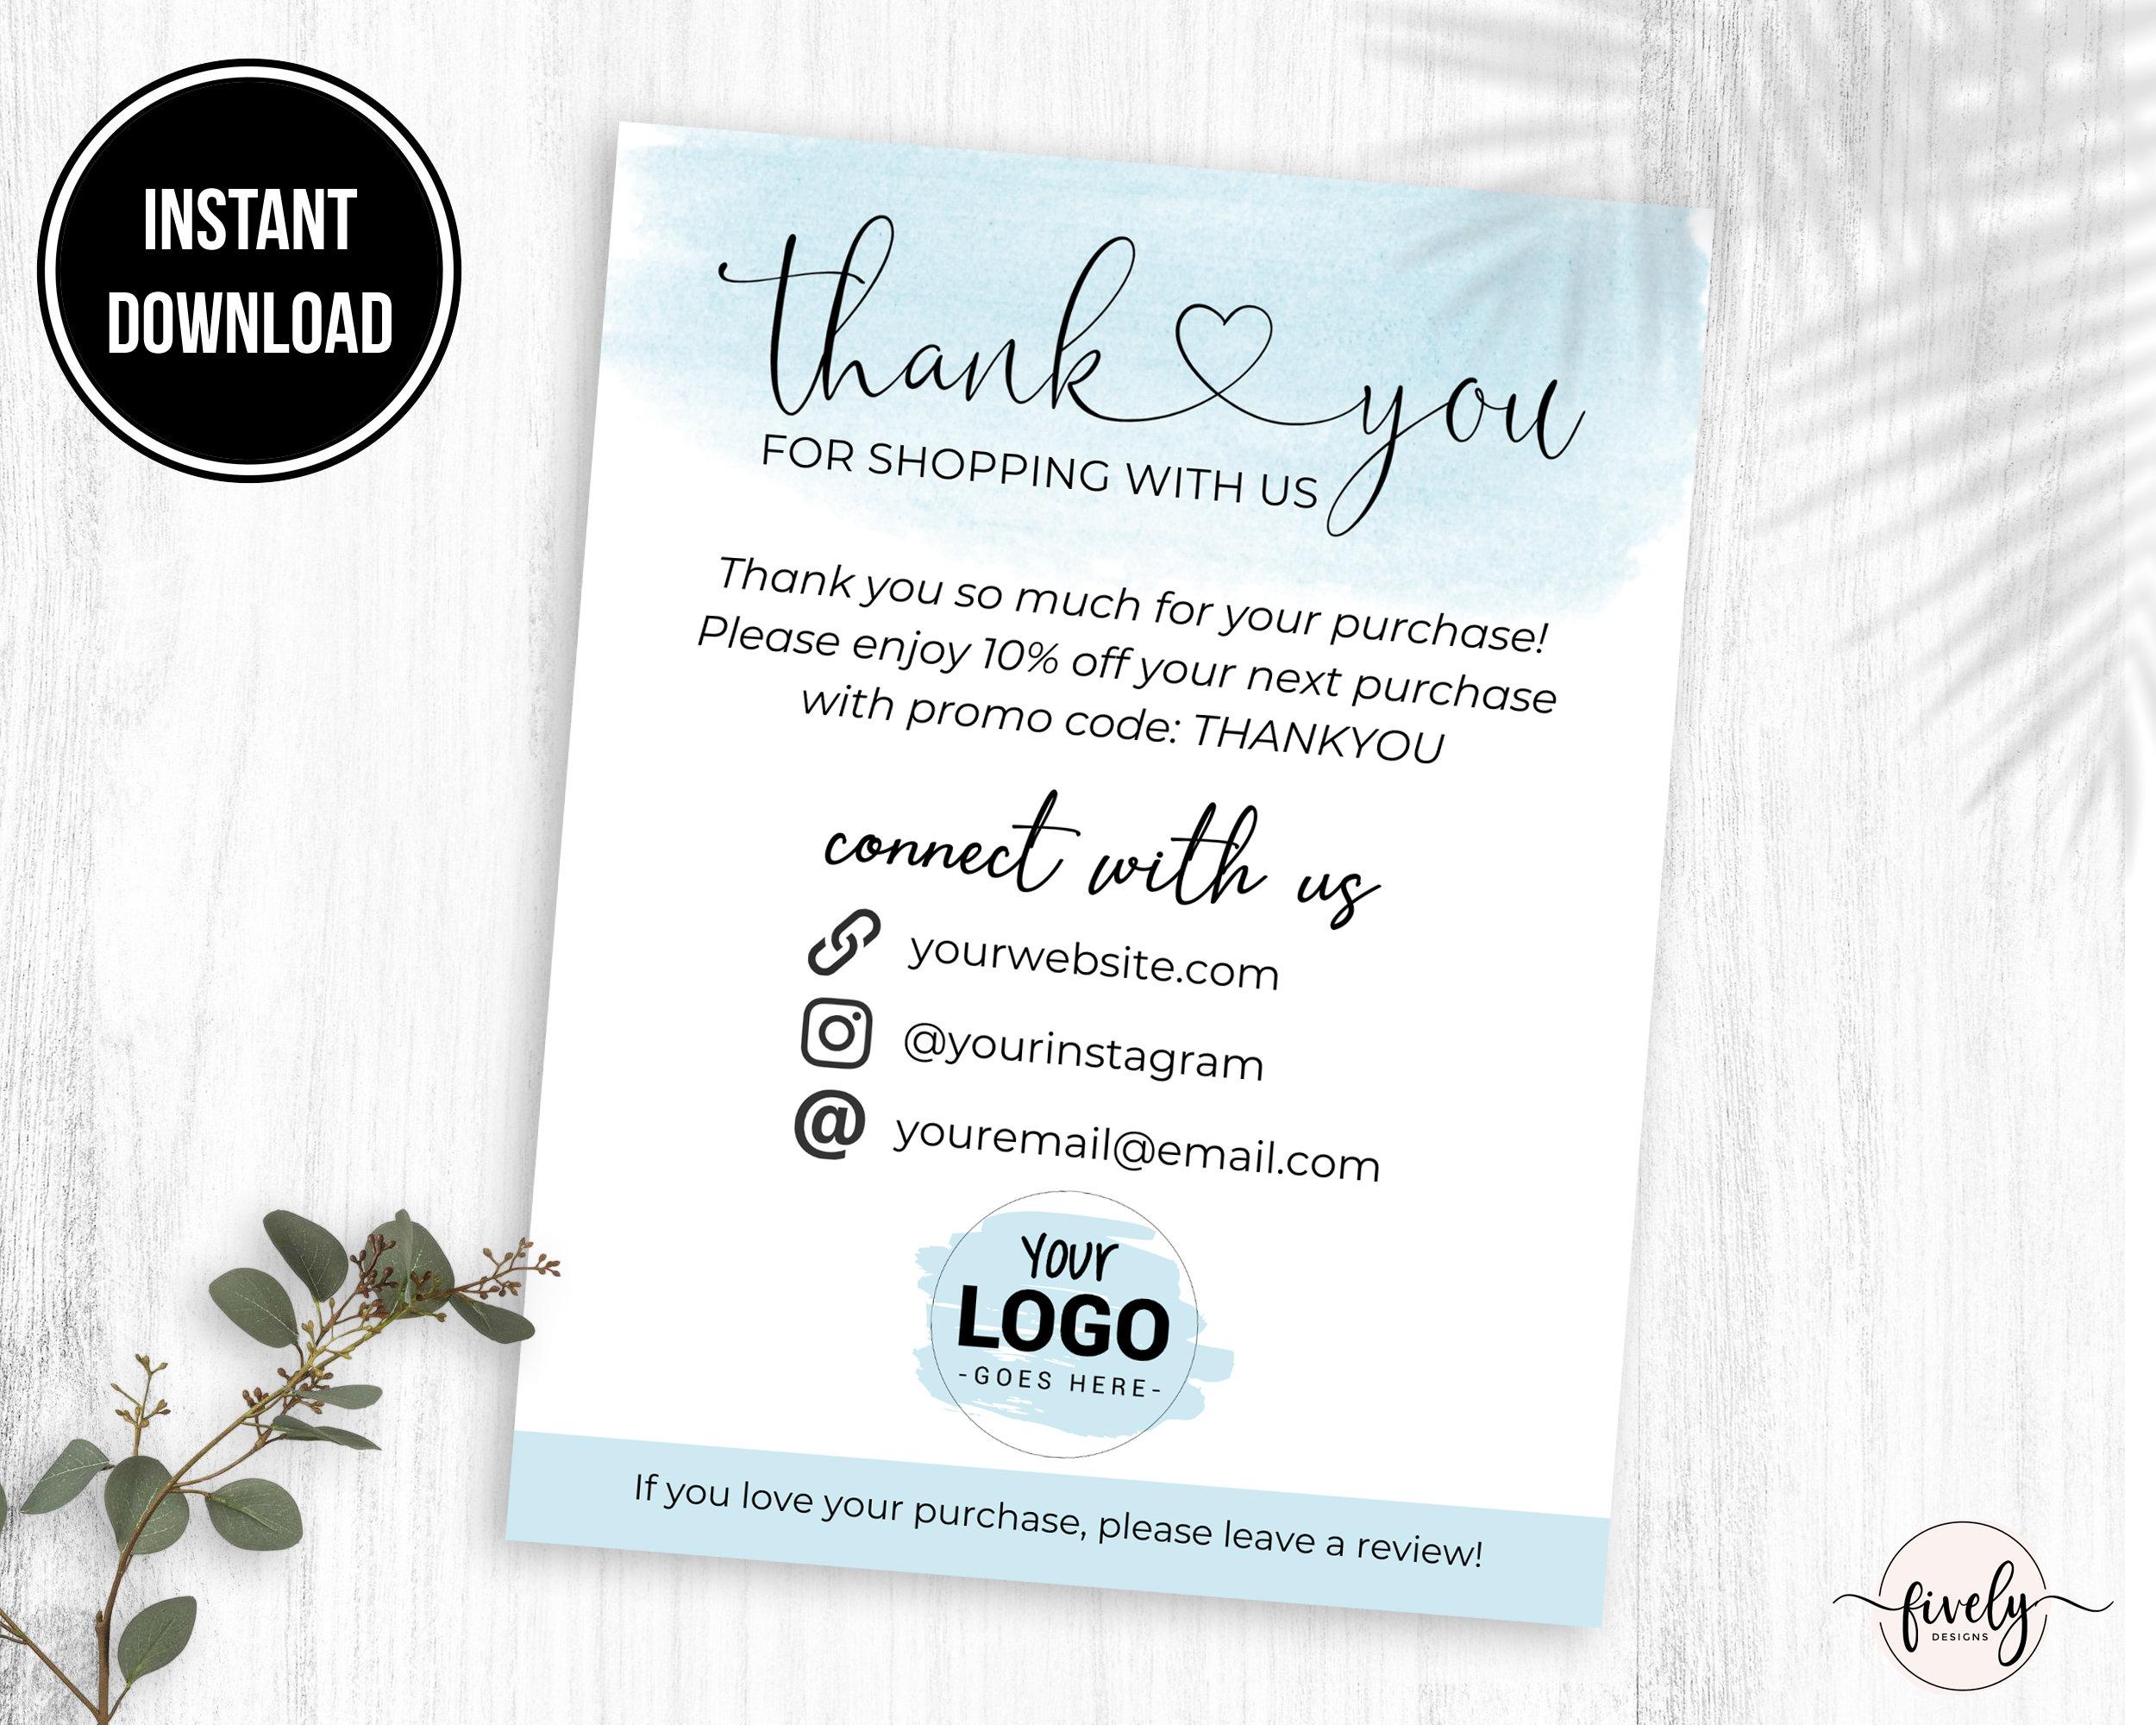 Thank You Business Card Template, Custom Thank You Cards For Poshmark Etsy  Mercari Ebay, Thank You Business Inserts, Customer Thank You Note